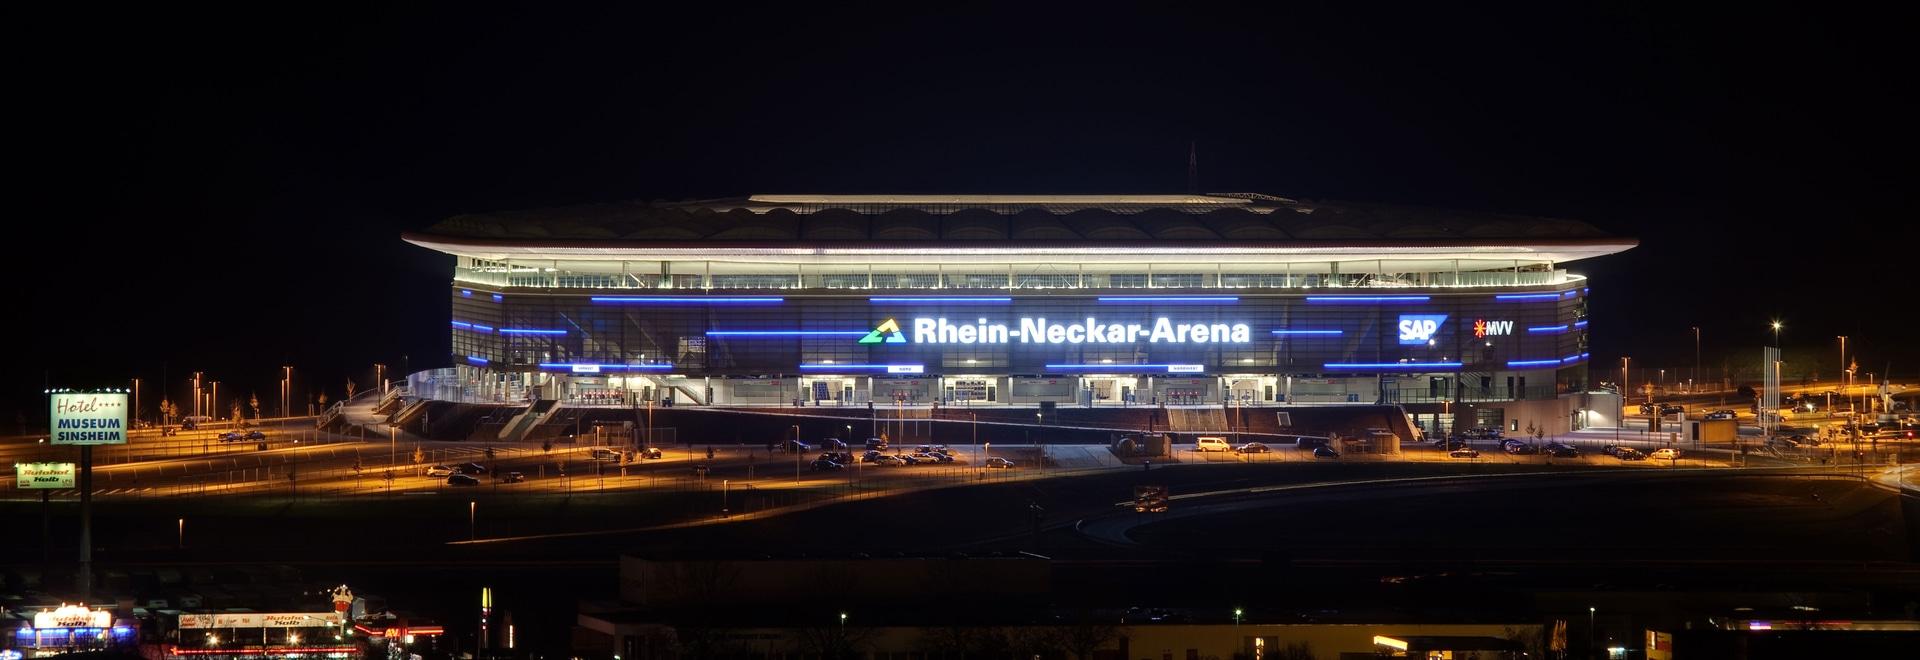 Rhin-Neckar-arena del TSG 1899 Hoffenheim